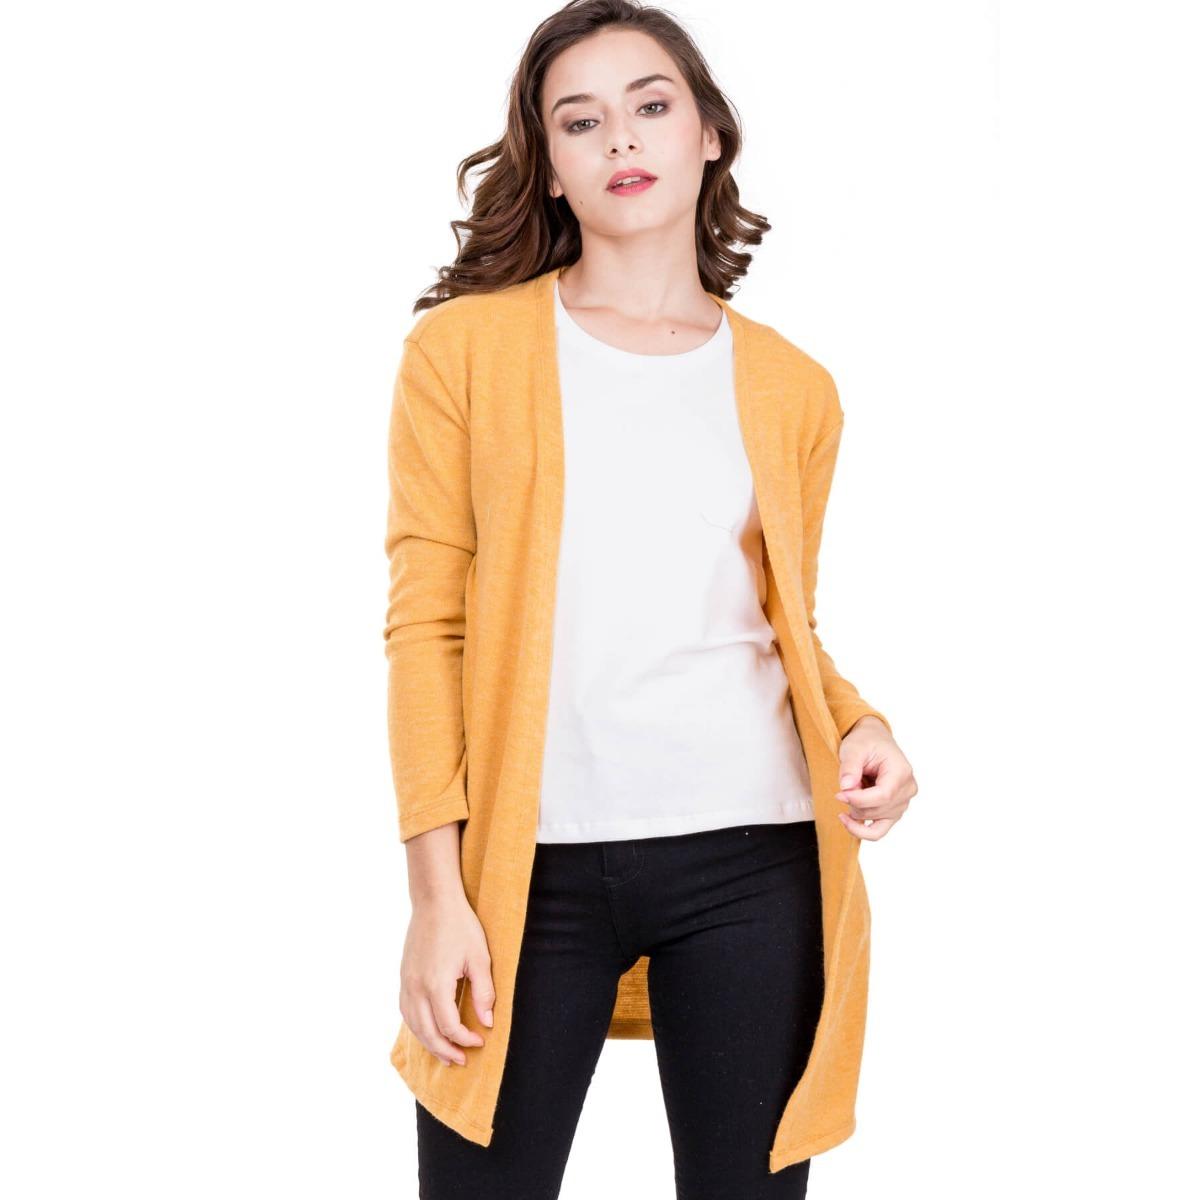 size 40 efe1a 9bba6 Saquito Cardigans De Mujer Sweater Largo Otoño Primavera